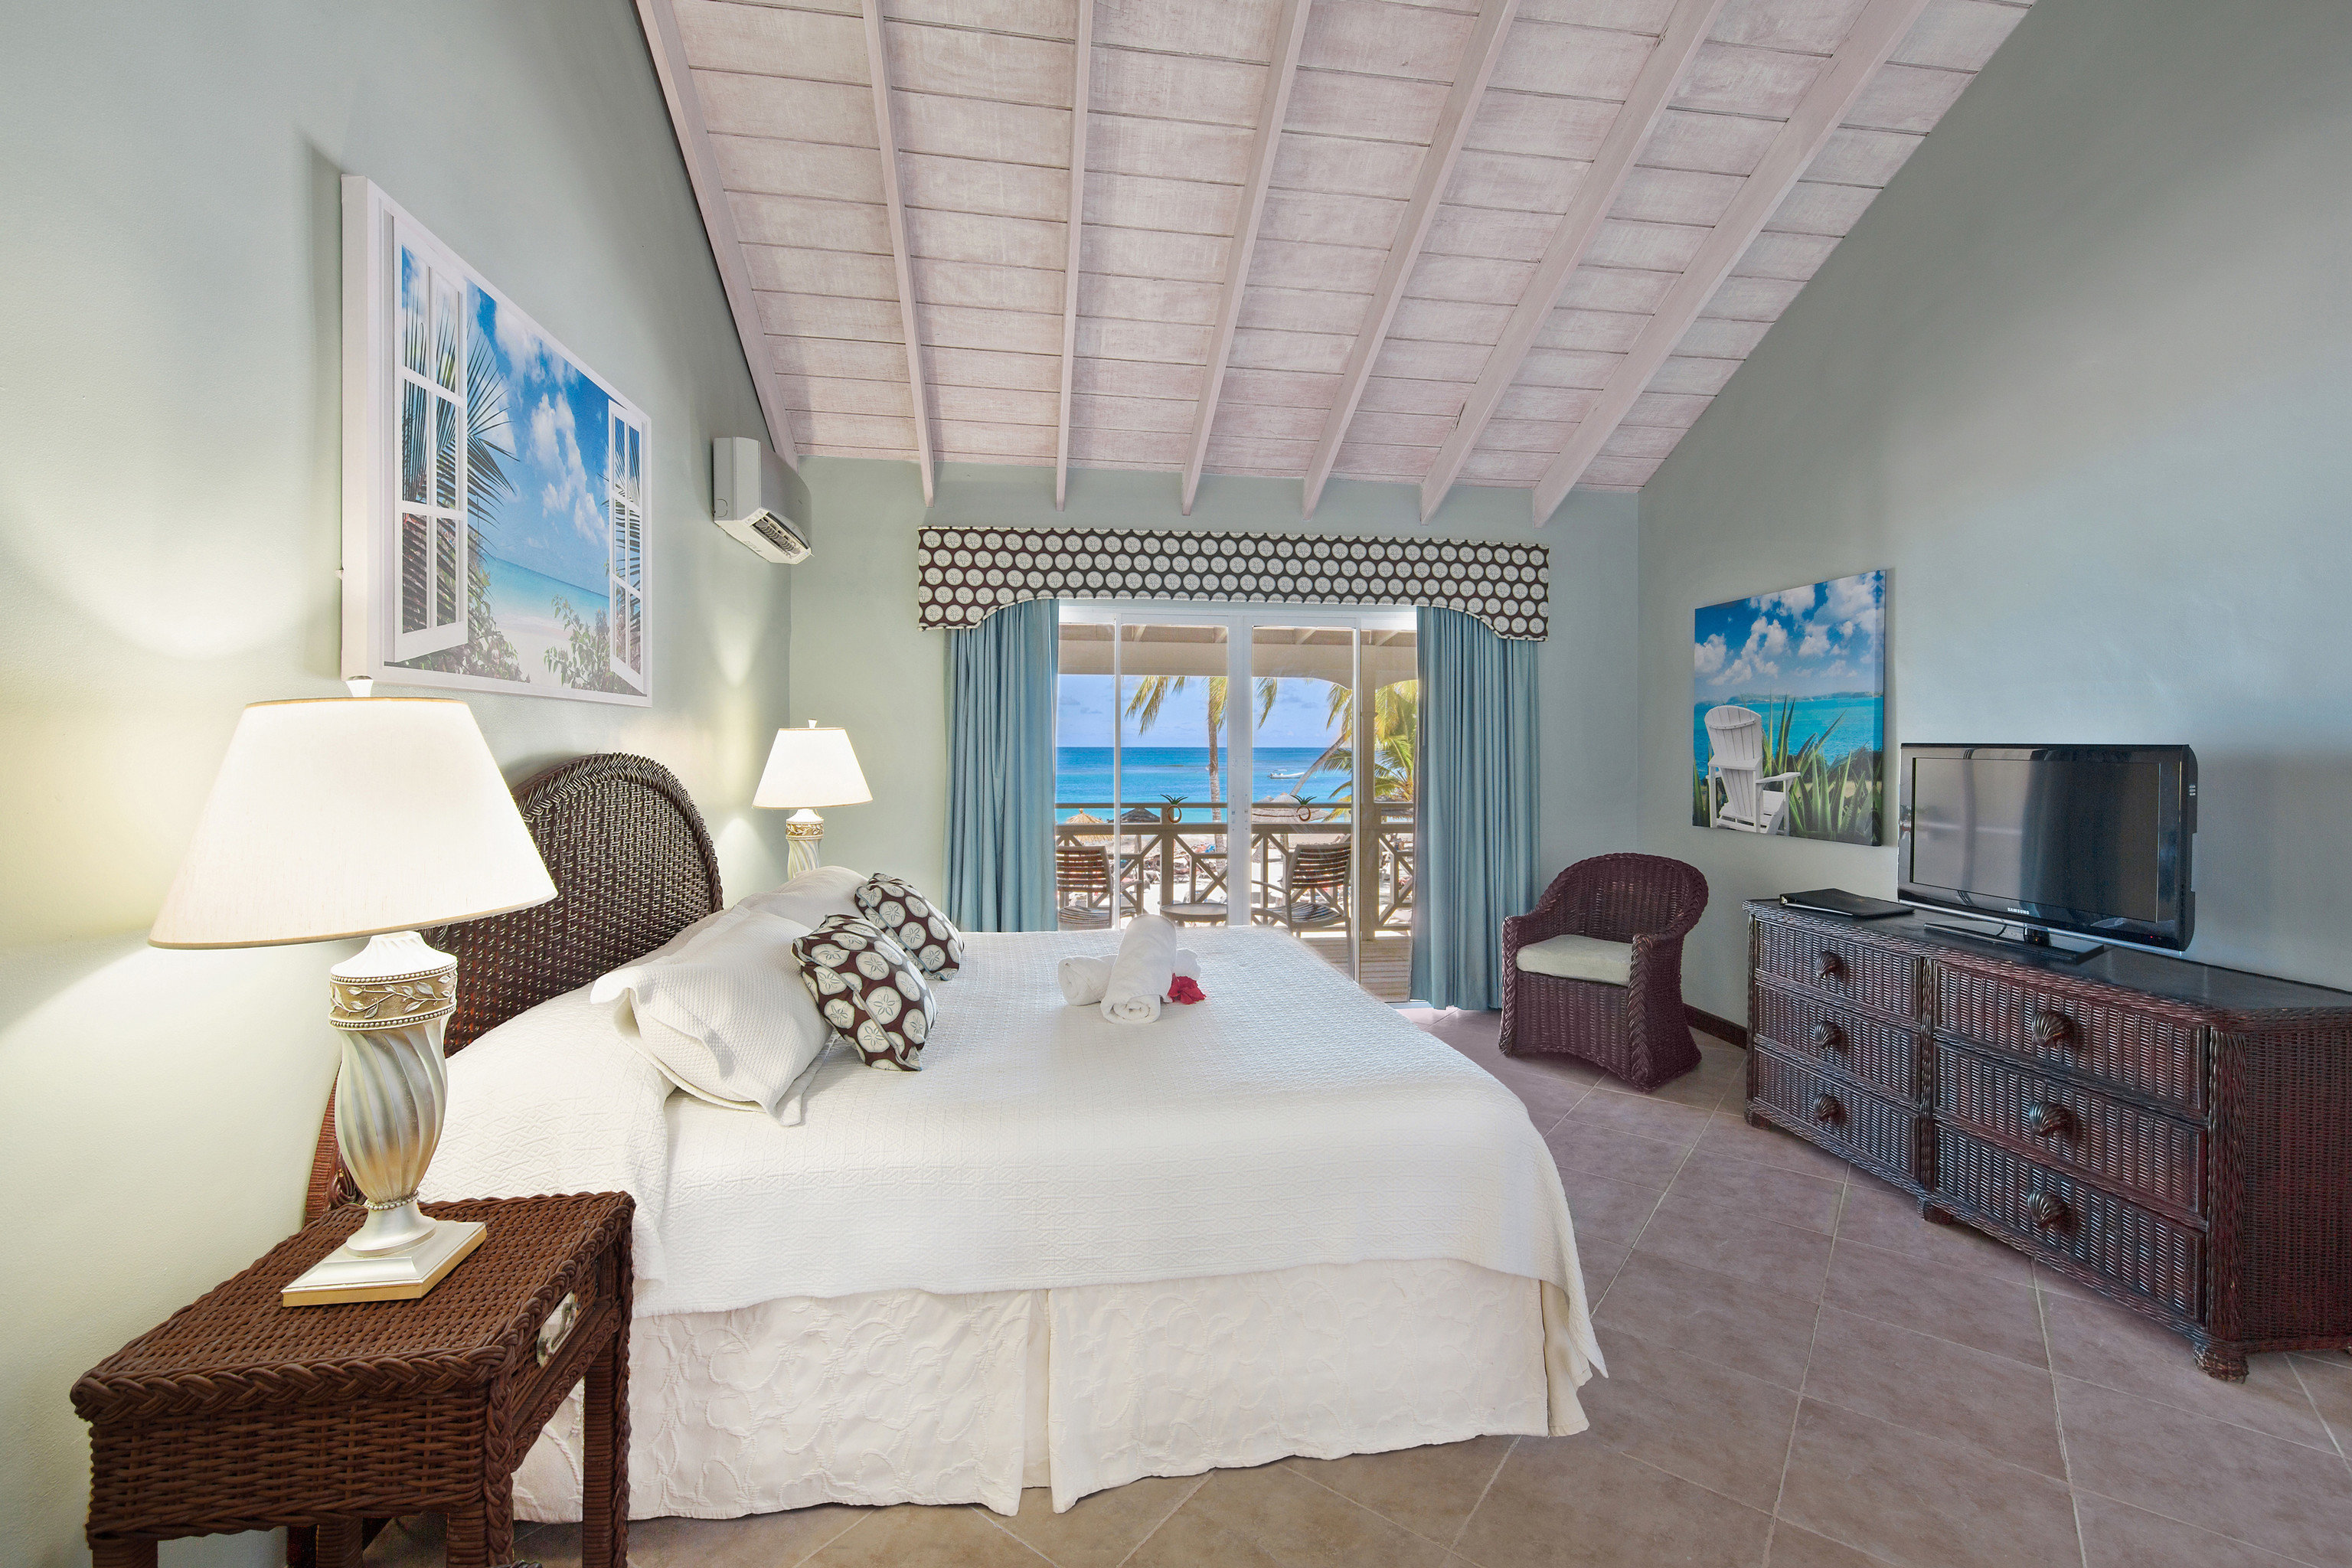 property Bedroom house living room home cottage Villa Suite condominium